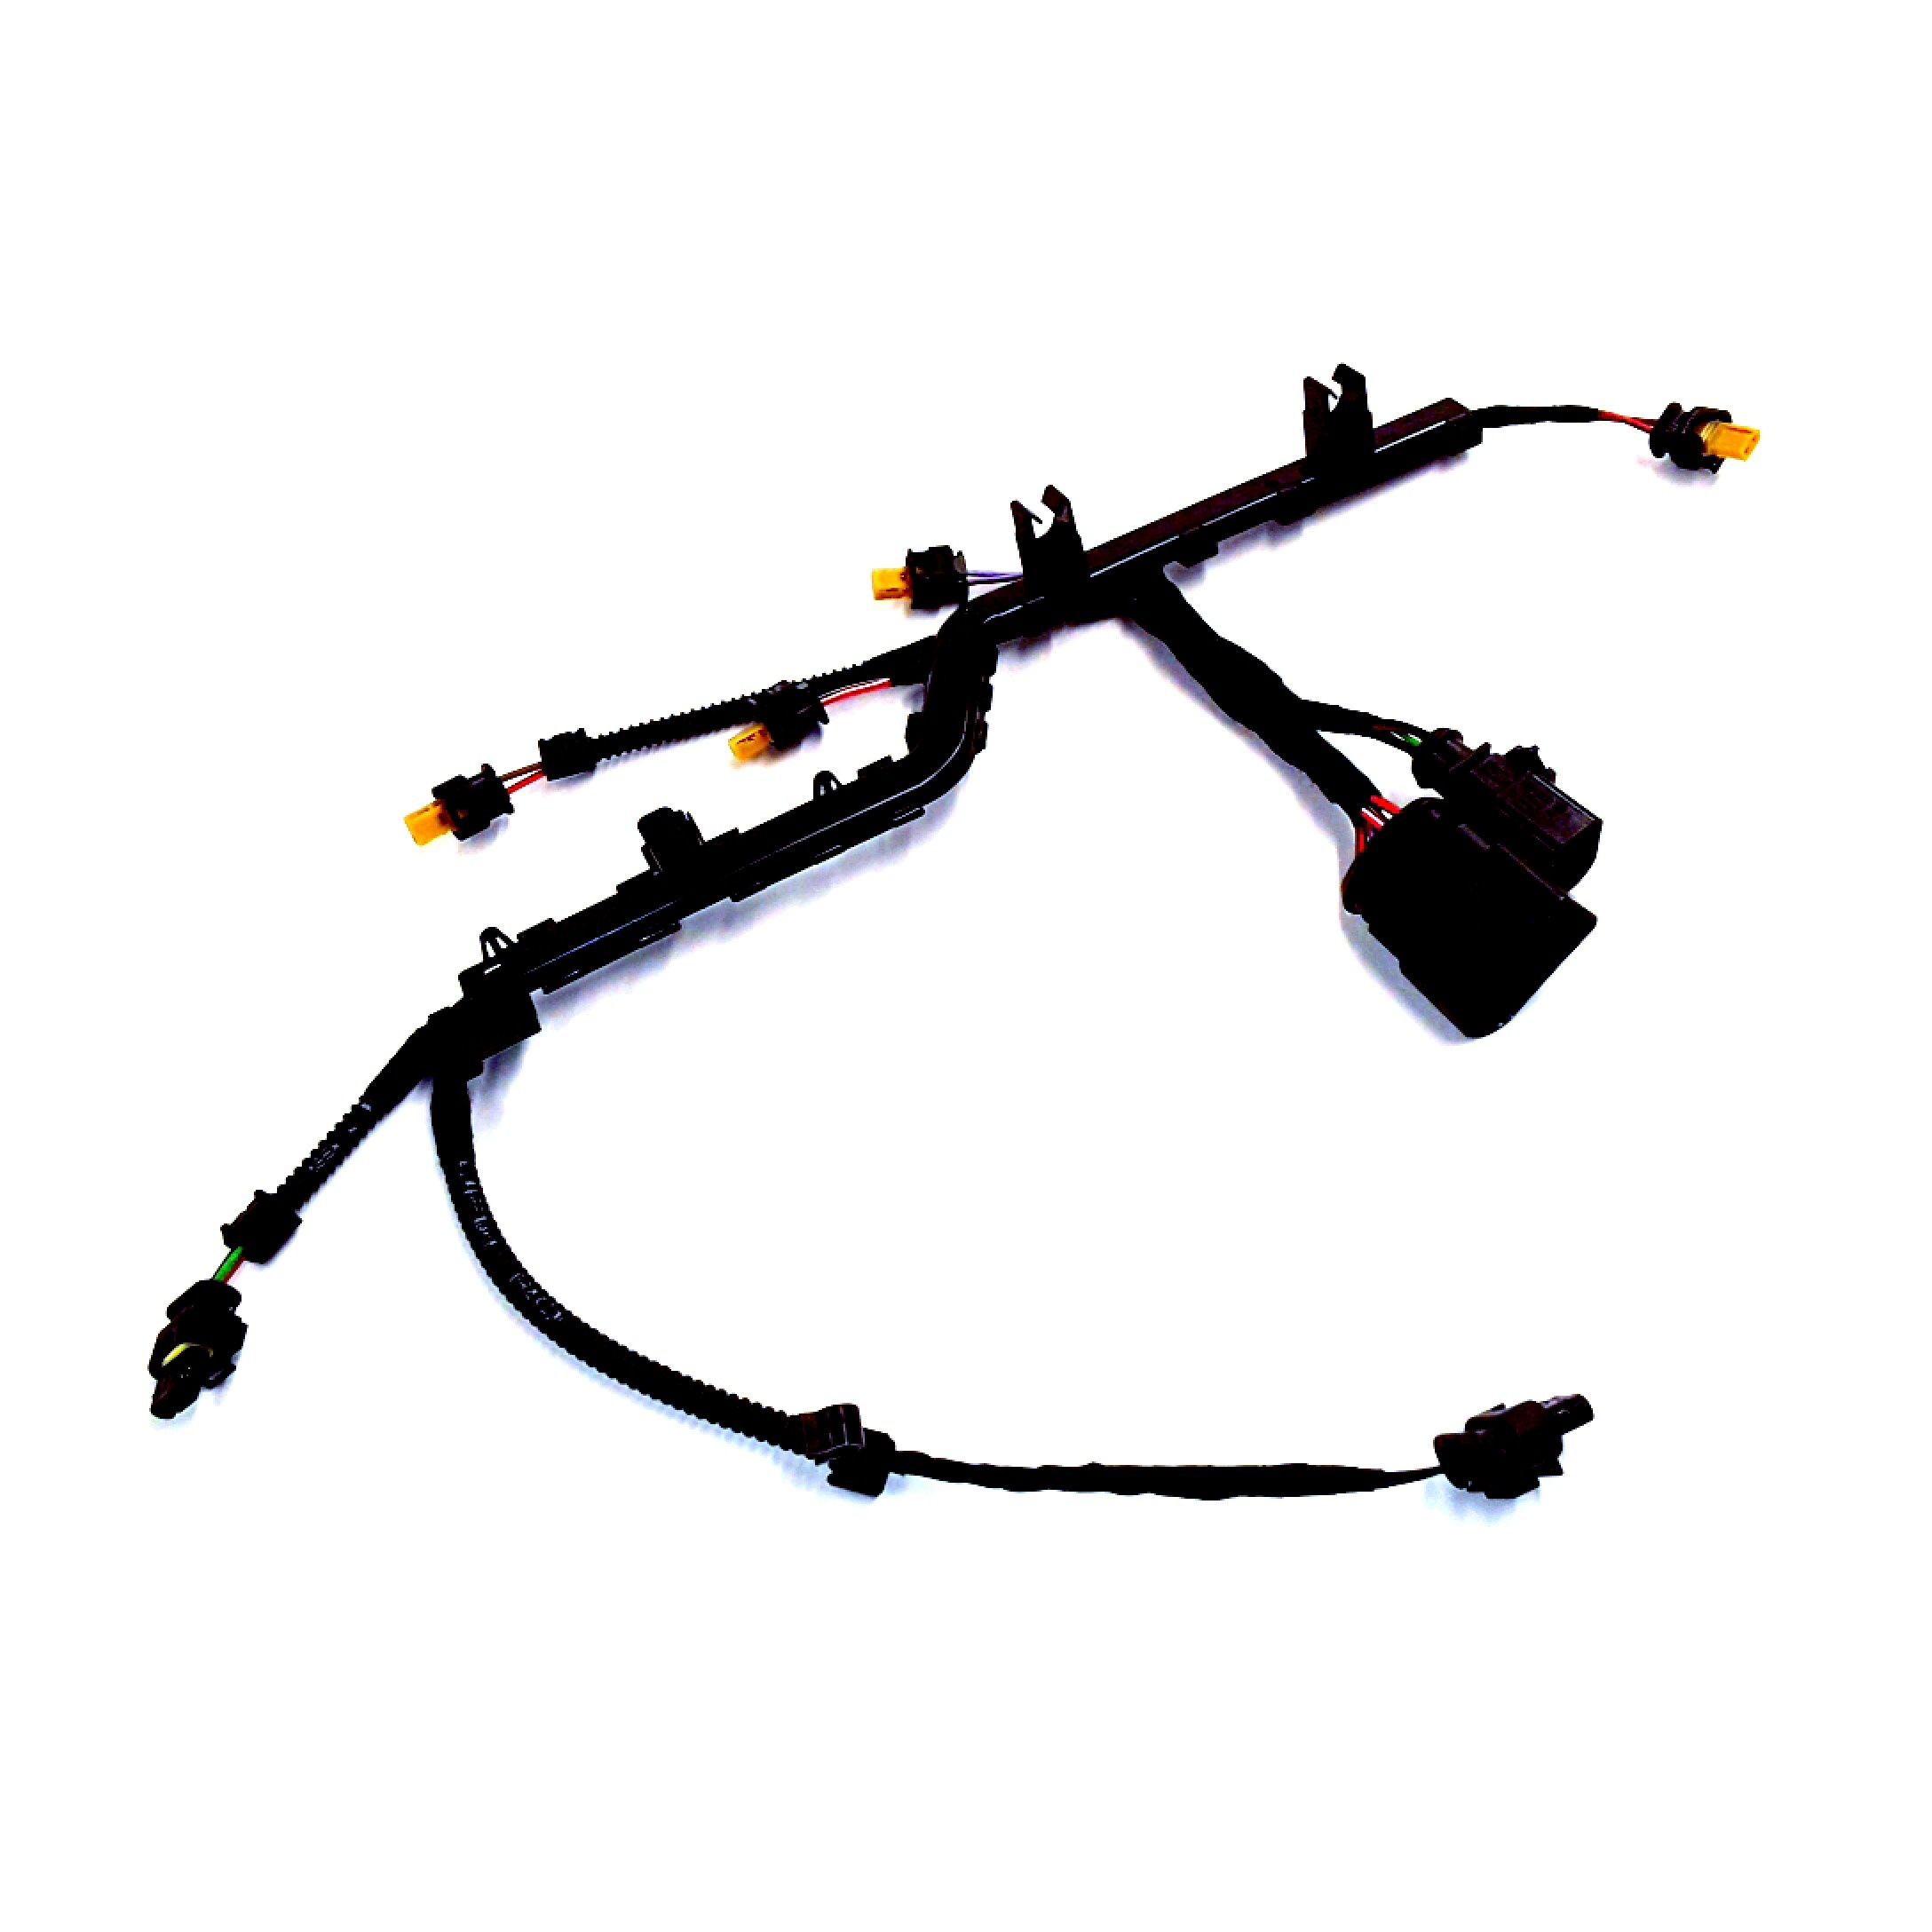 06j971082d Volkswagen Engine Wiring Harness Spark Plug